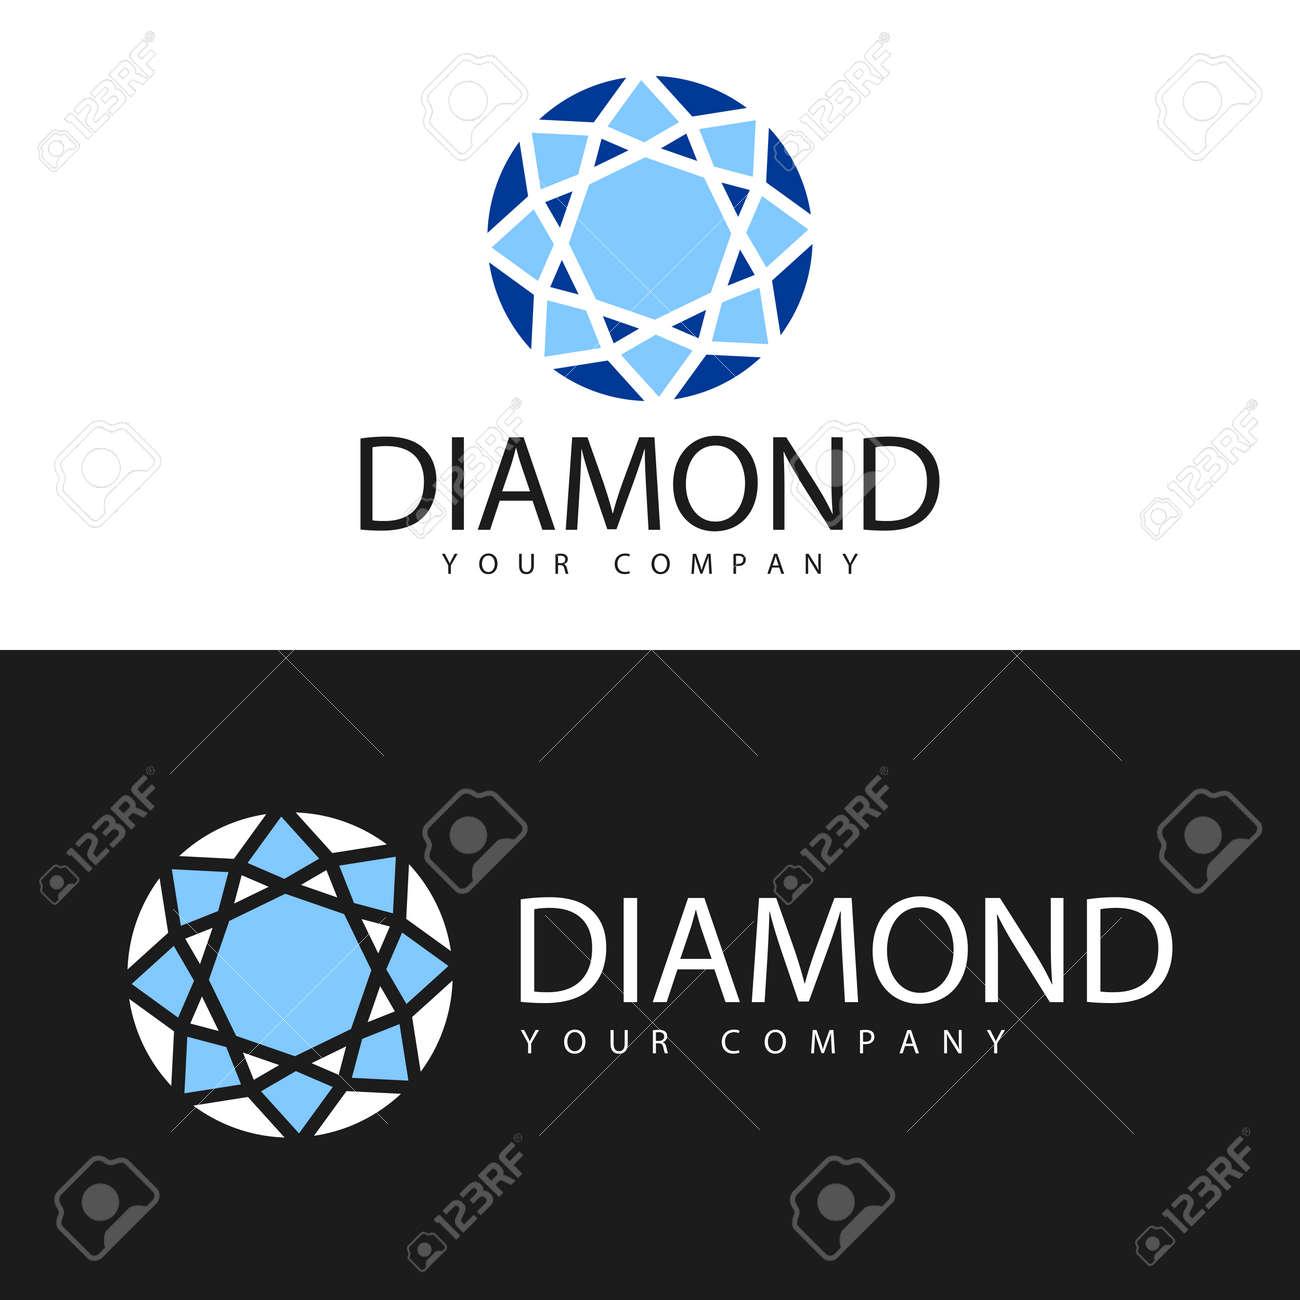 Diamond design. - 169208486